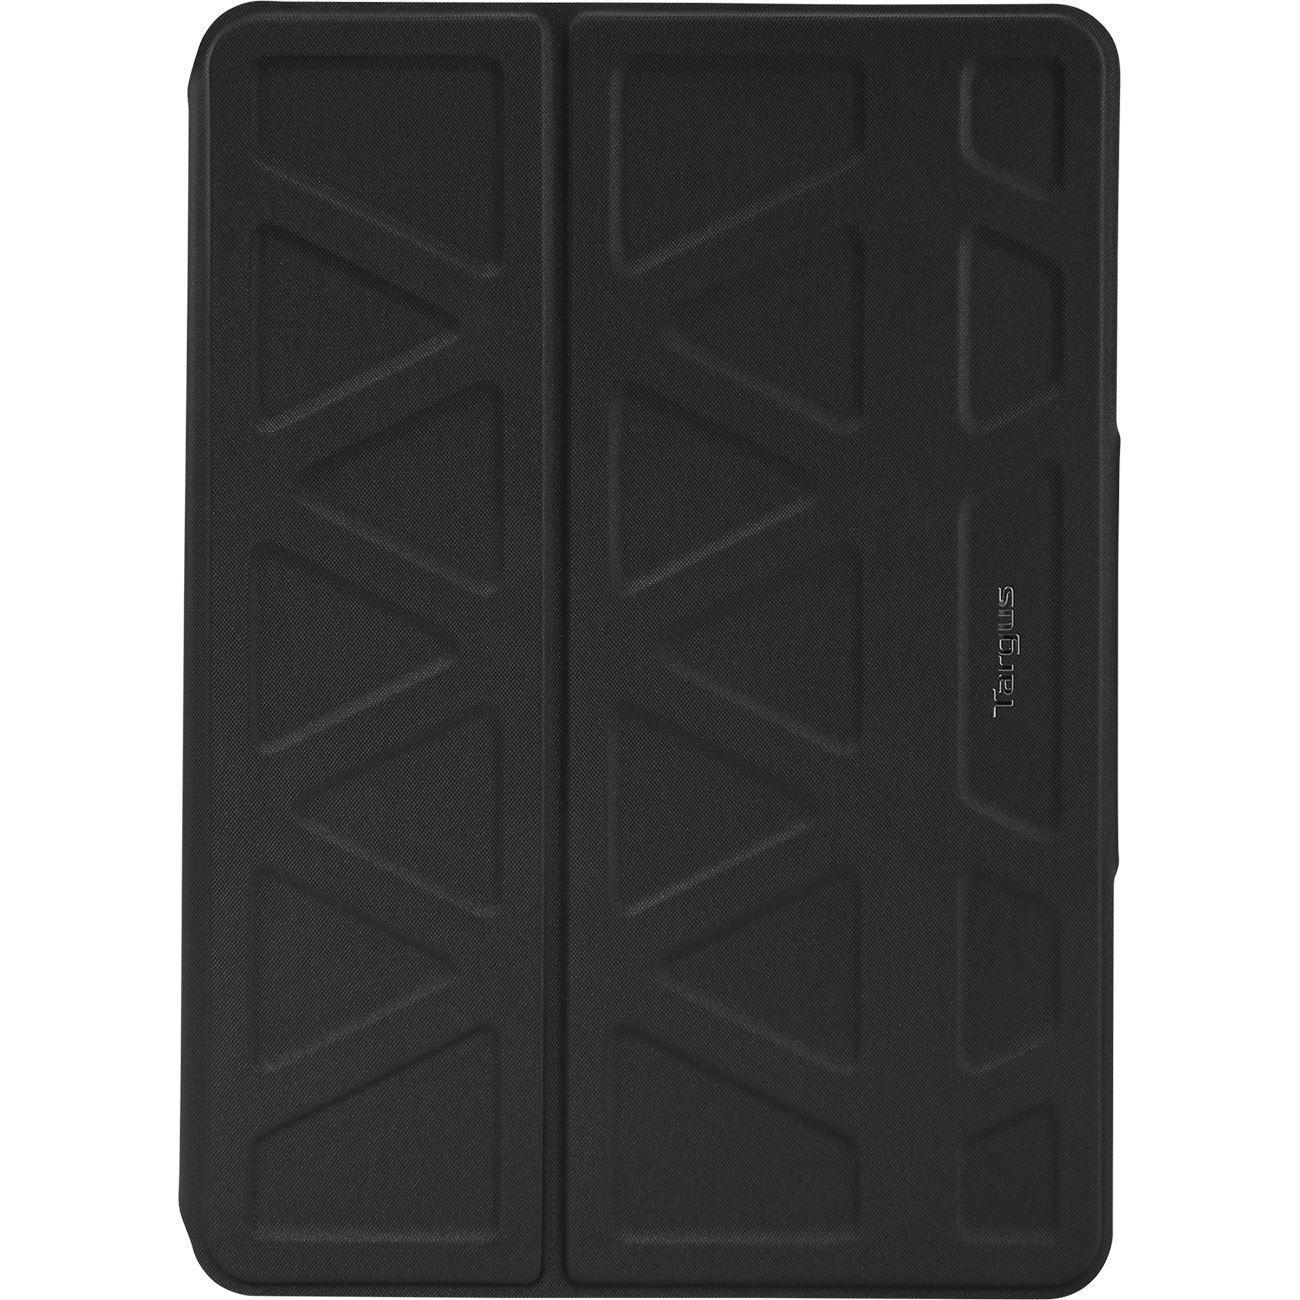 3D Protection Case (Black) - THZ635GL